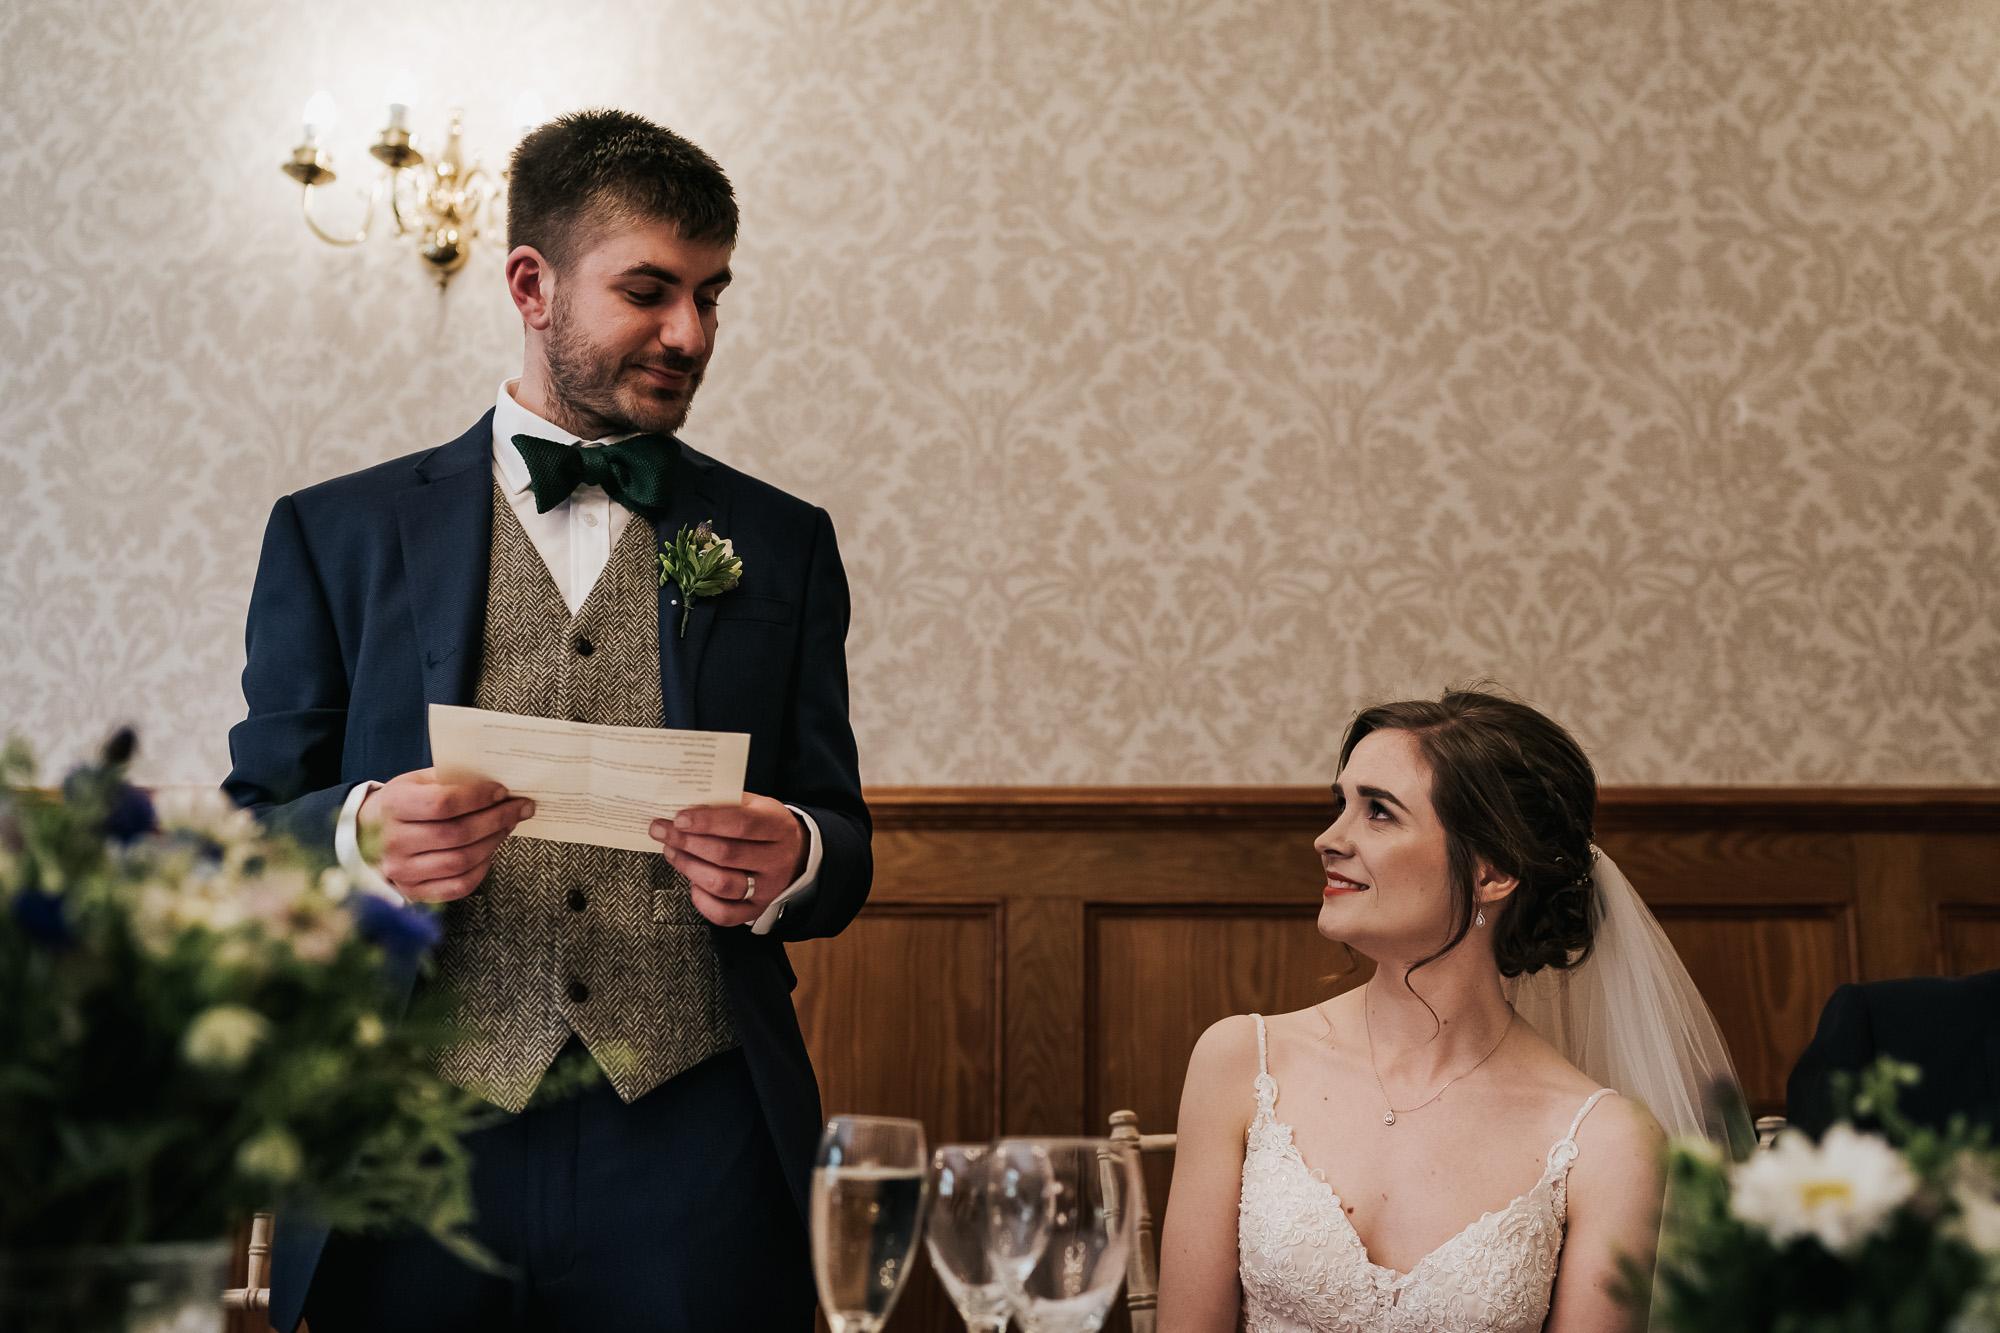 Nunsmere Hall Hotel Wedding photograhpy in cheshire wedding photographer (33 of 42).jpg